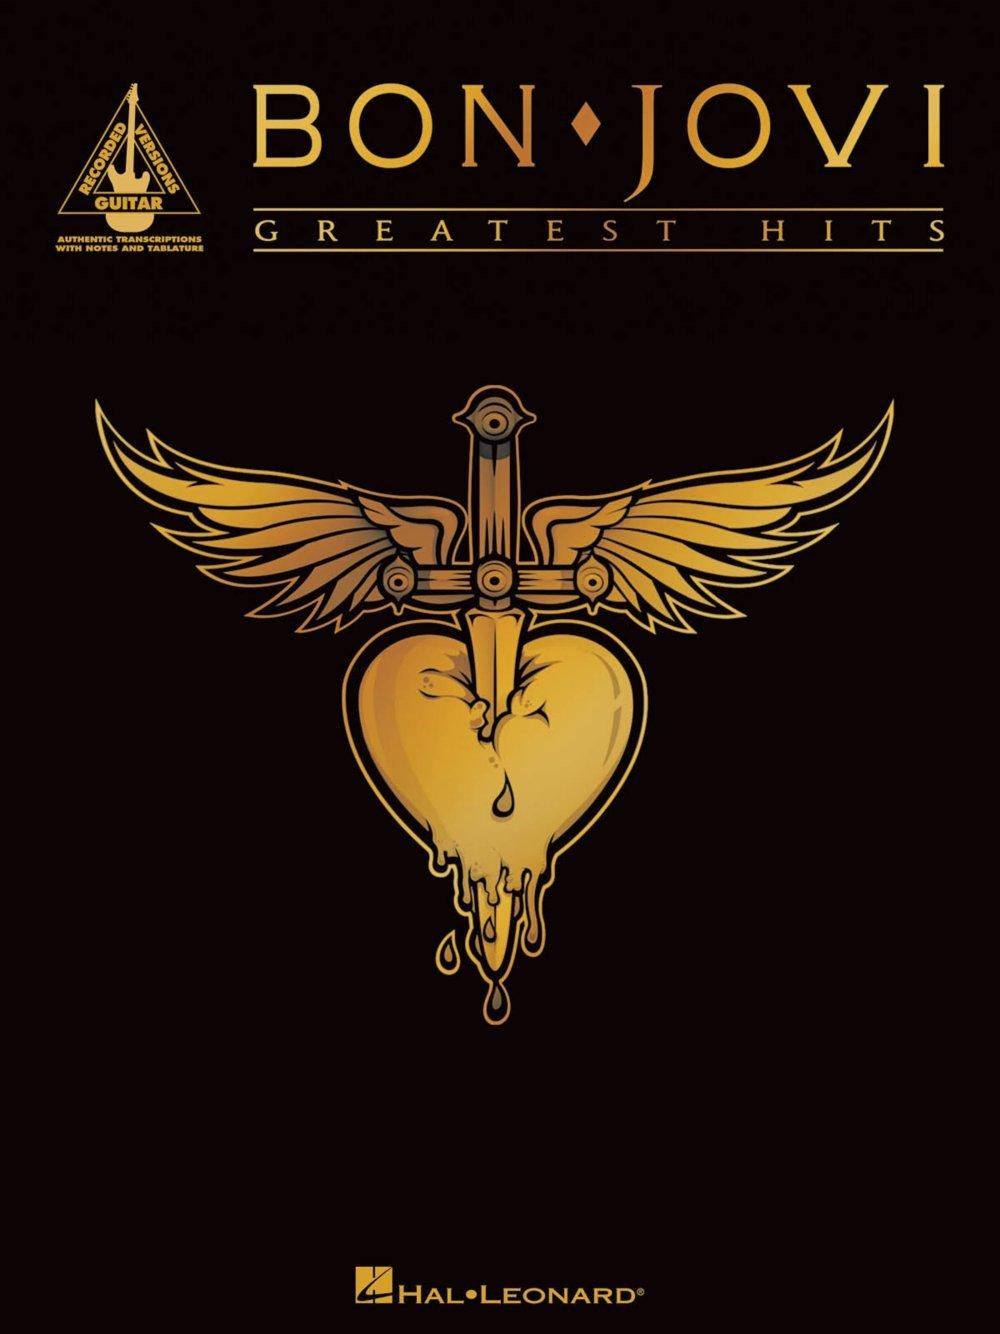 Hal Leonard Bon Jovi Greatest Hits Guitar Tab Songbook Hal